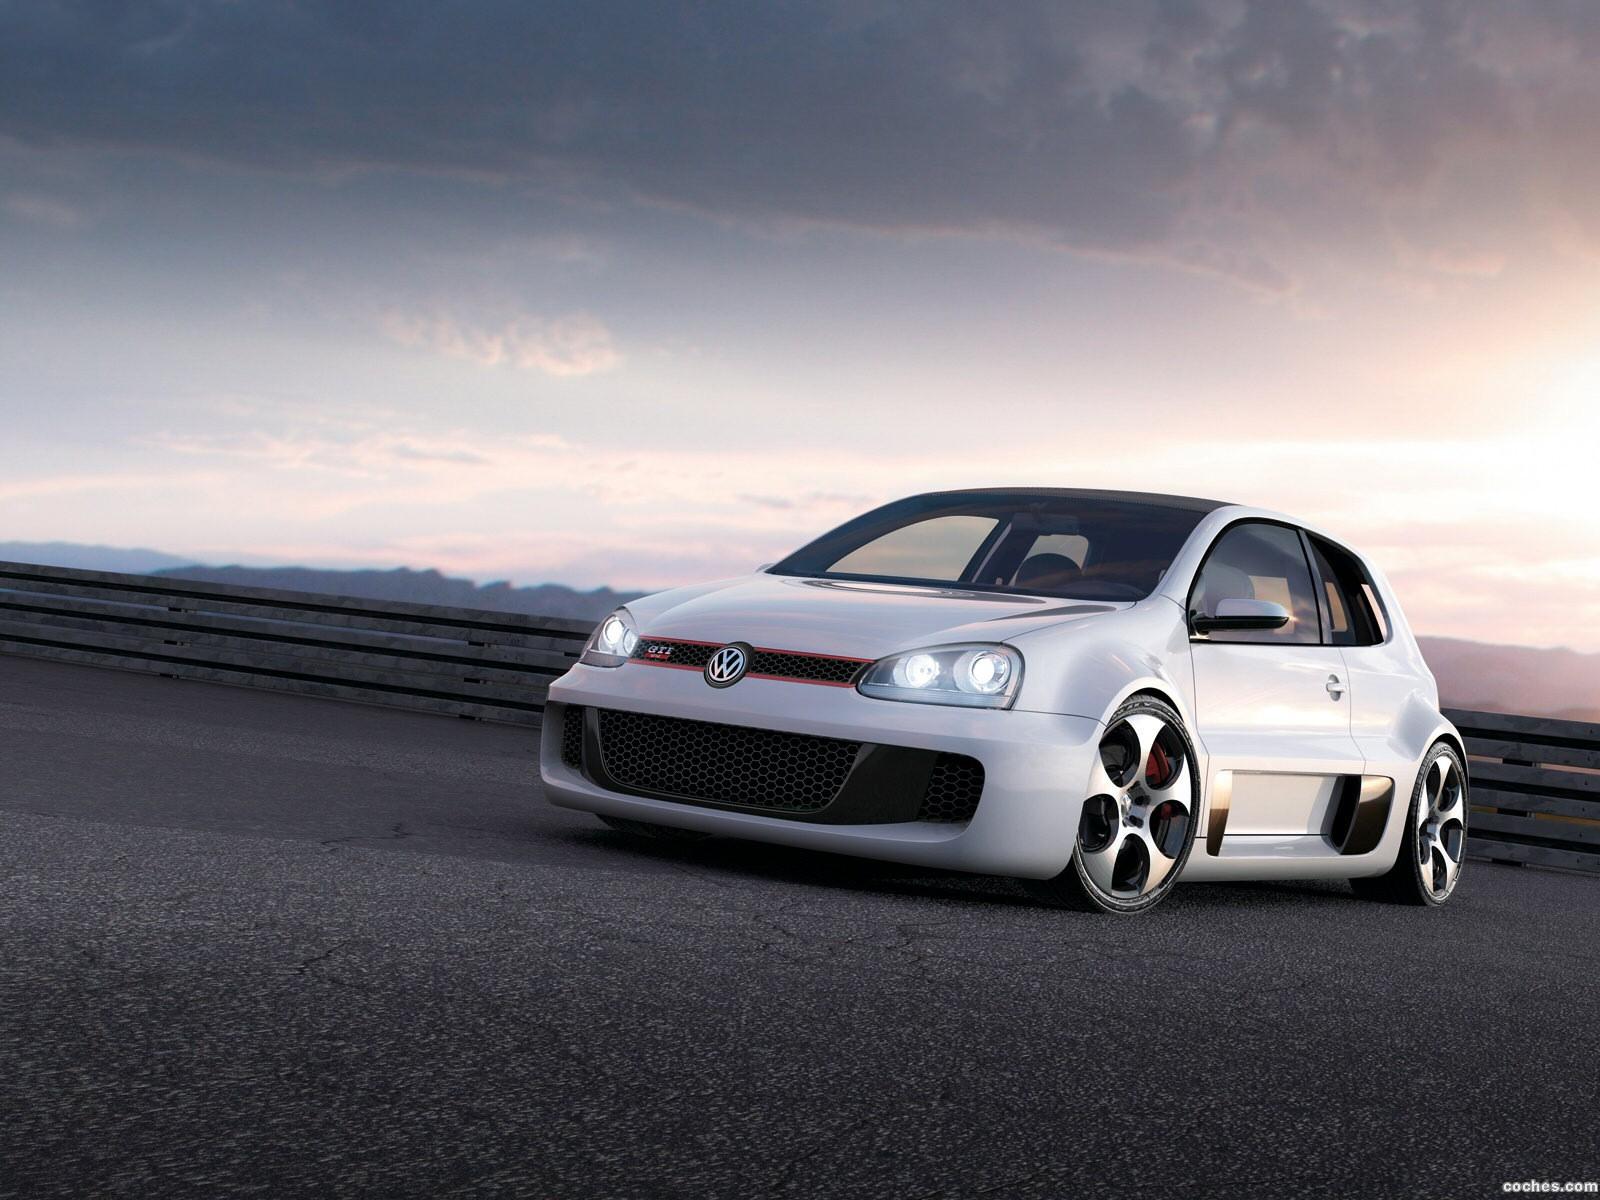 Foto 0 de Volkswagen Golf GTI W12 650 2007